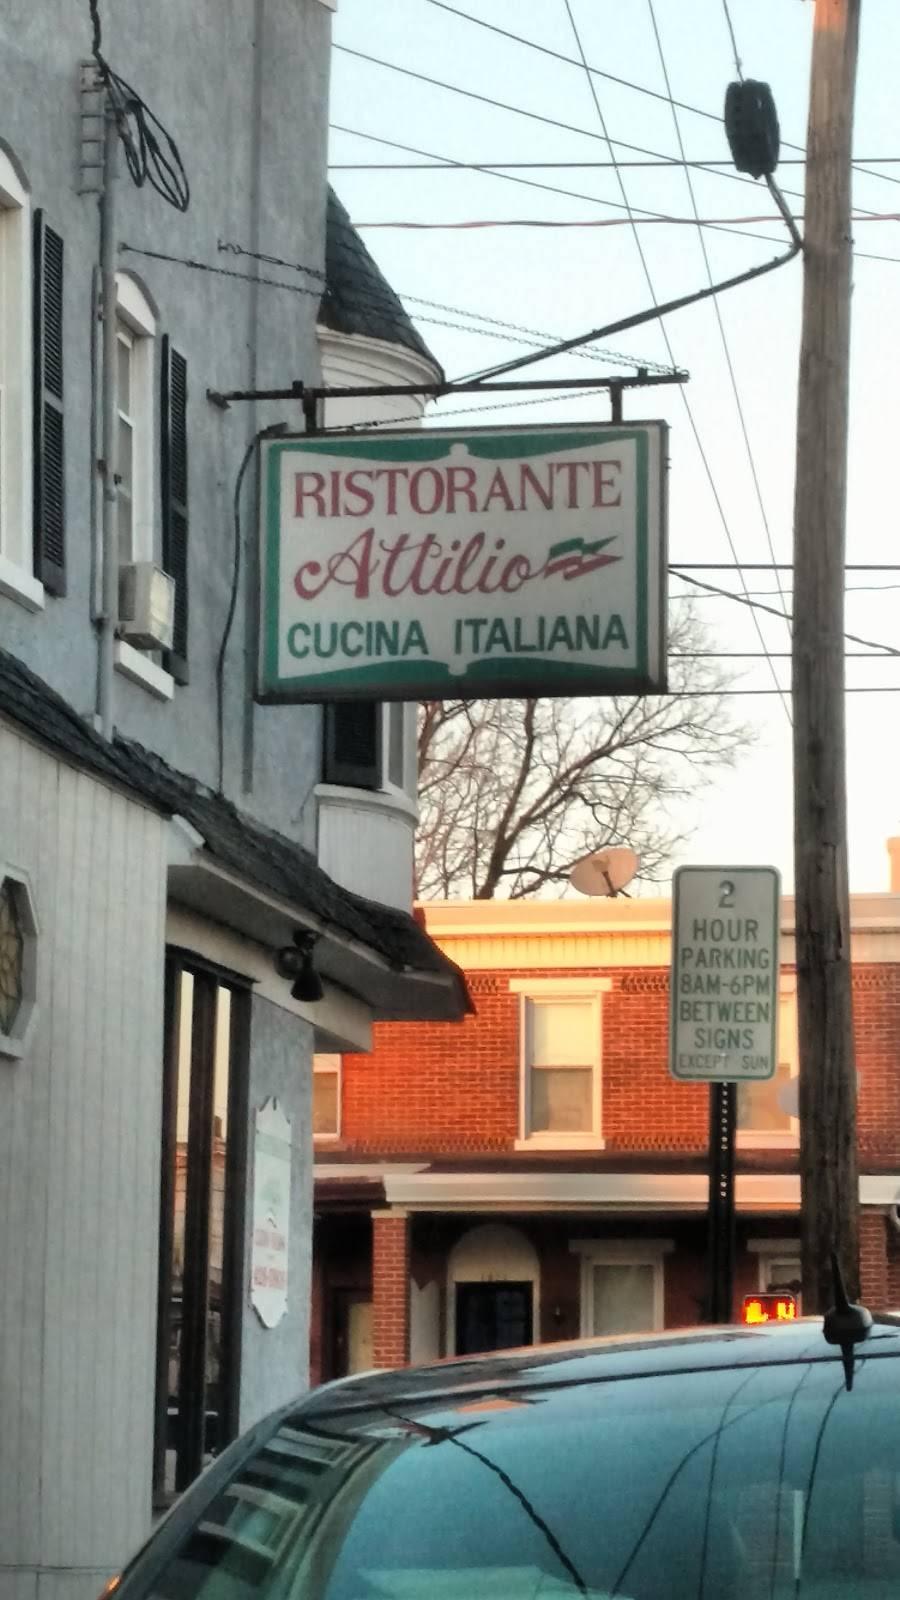 Ristorante Attilio | restaurant | 1900 Lancaster Ave, Wilmington, DE 19805, USA | 3024280909 OR +1 302-428-0909